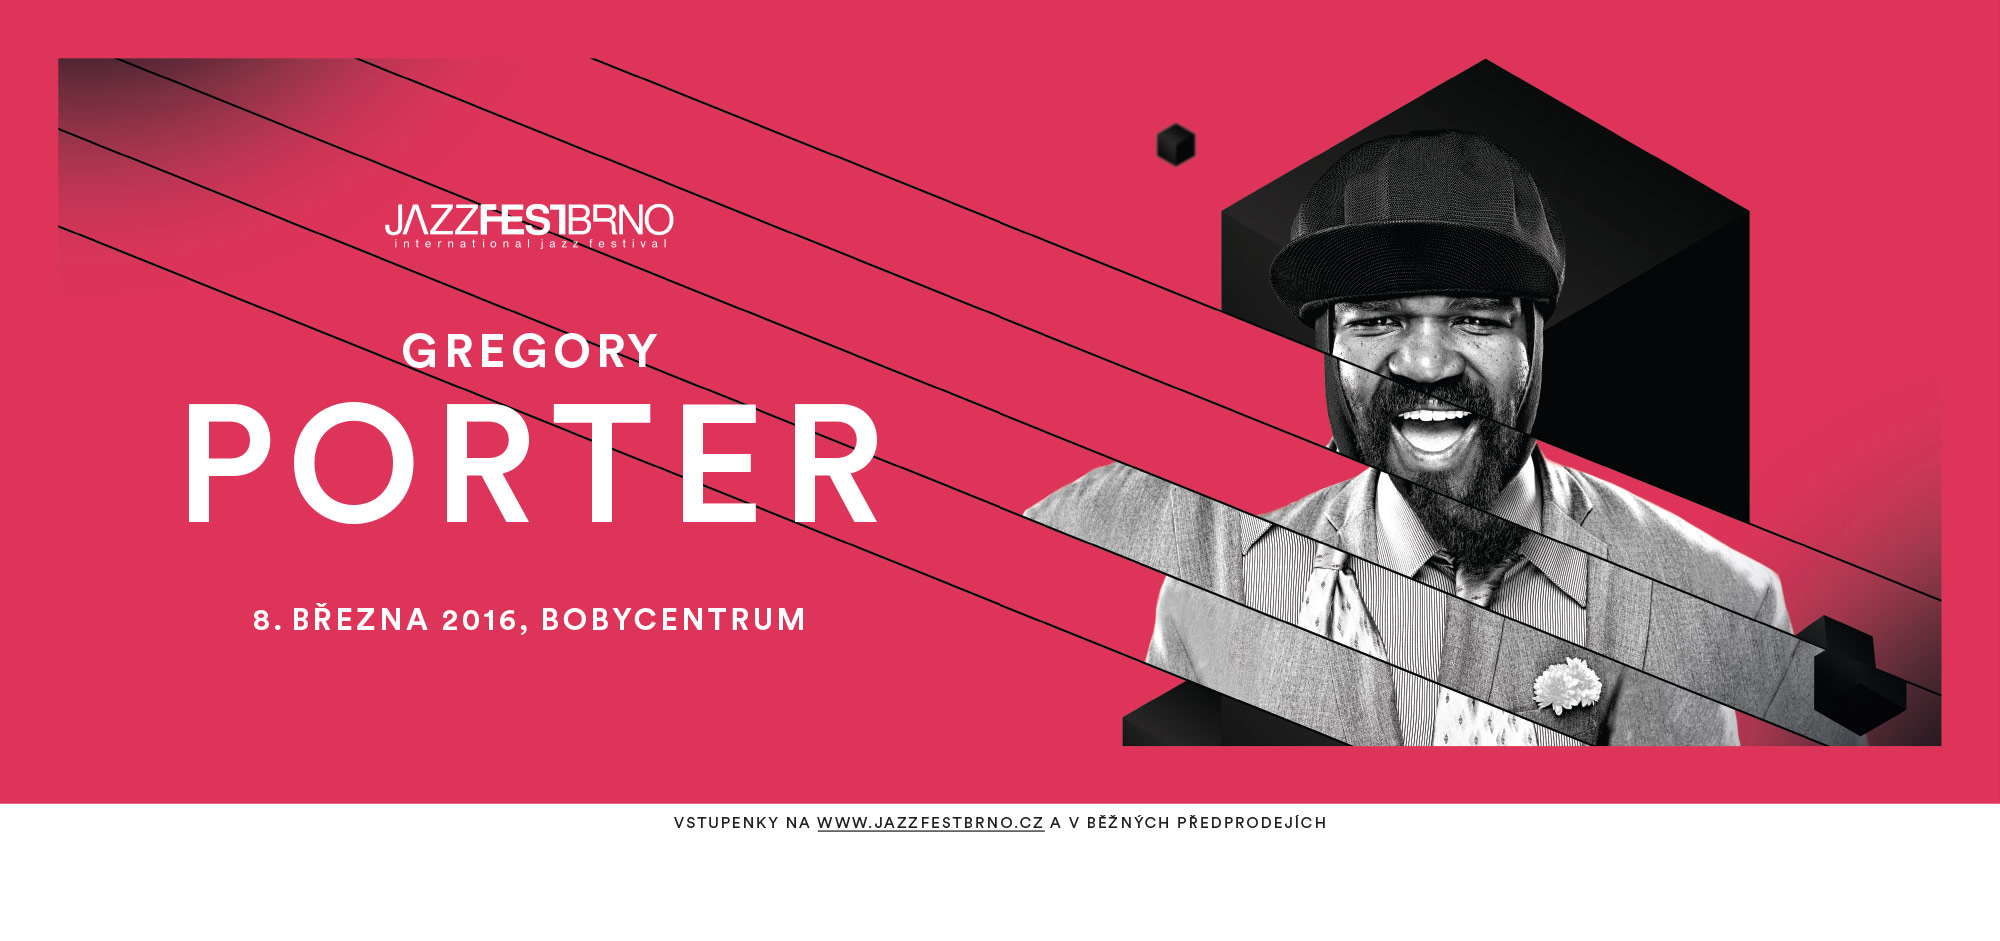 Jazzfestbrno 2016 - Gregory Porter